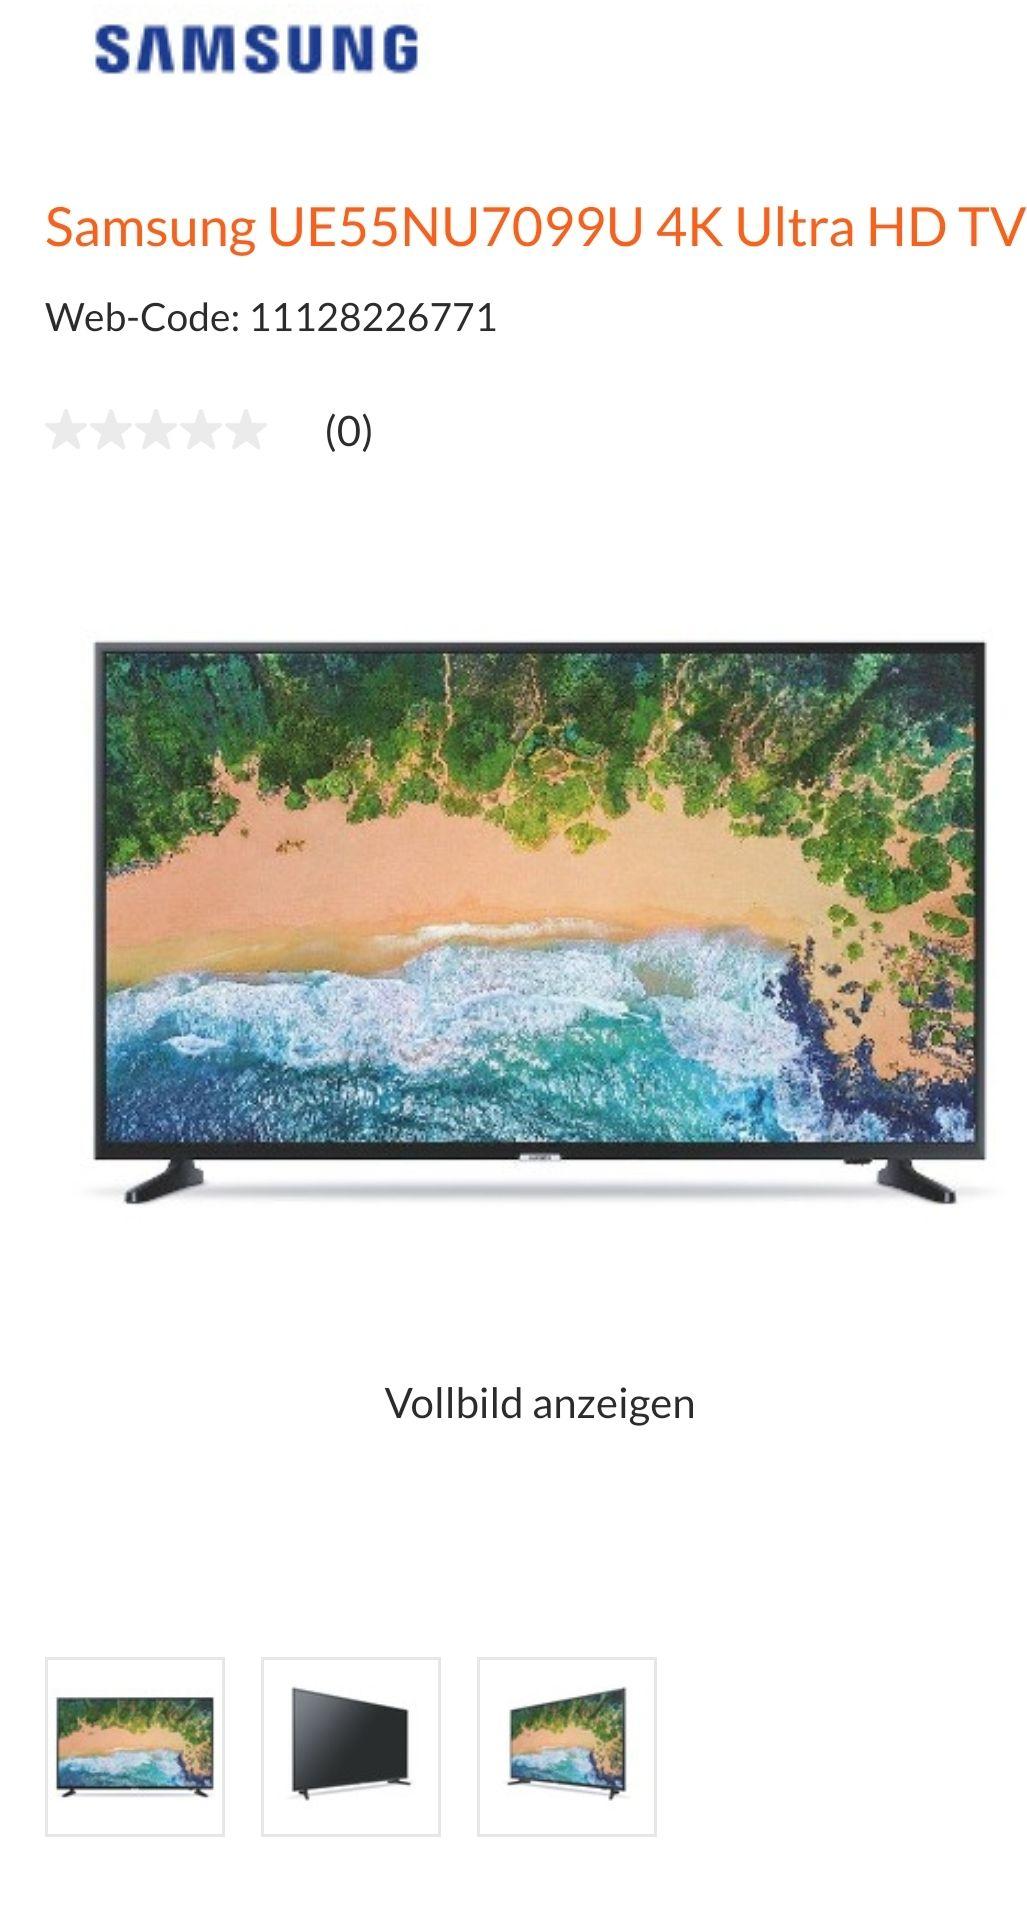 Samsung 4K Ultra HD TV UE55NU7099U